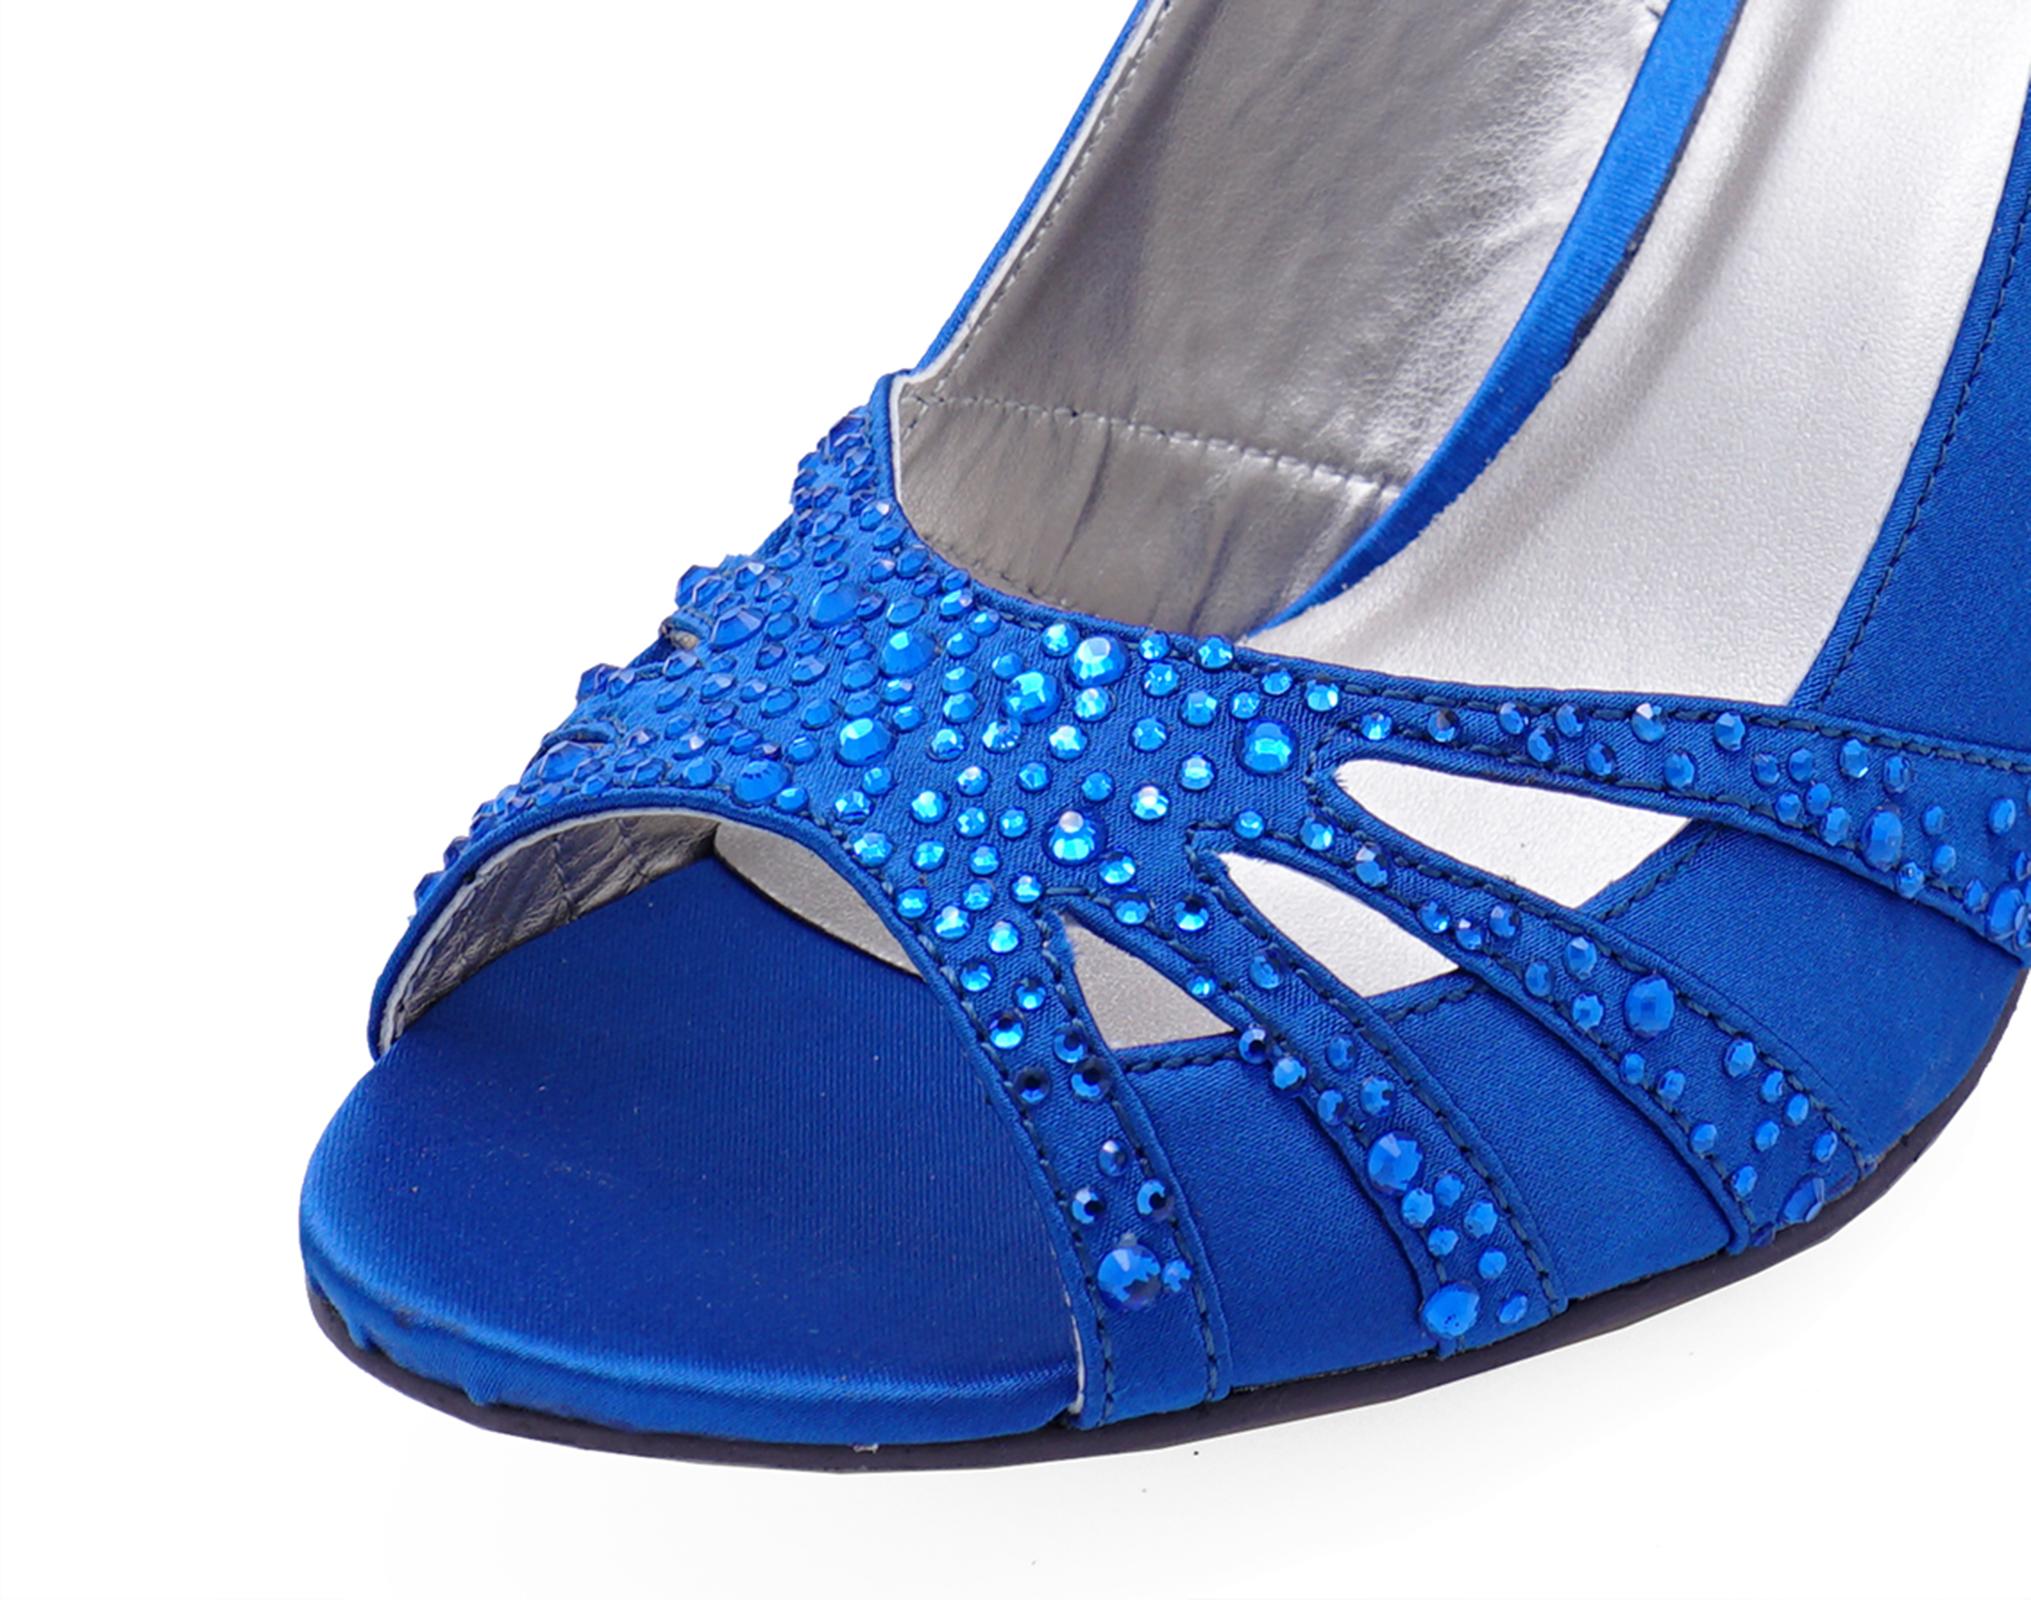 toe Prom Shoes Diamante Slingback Blue 8 Uk Wedding Open 3 Ladies Party wnxaqpCfE4